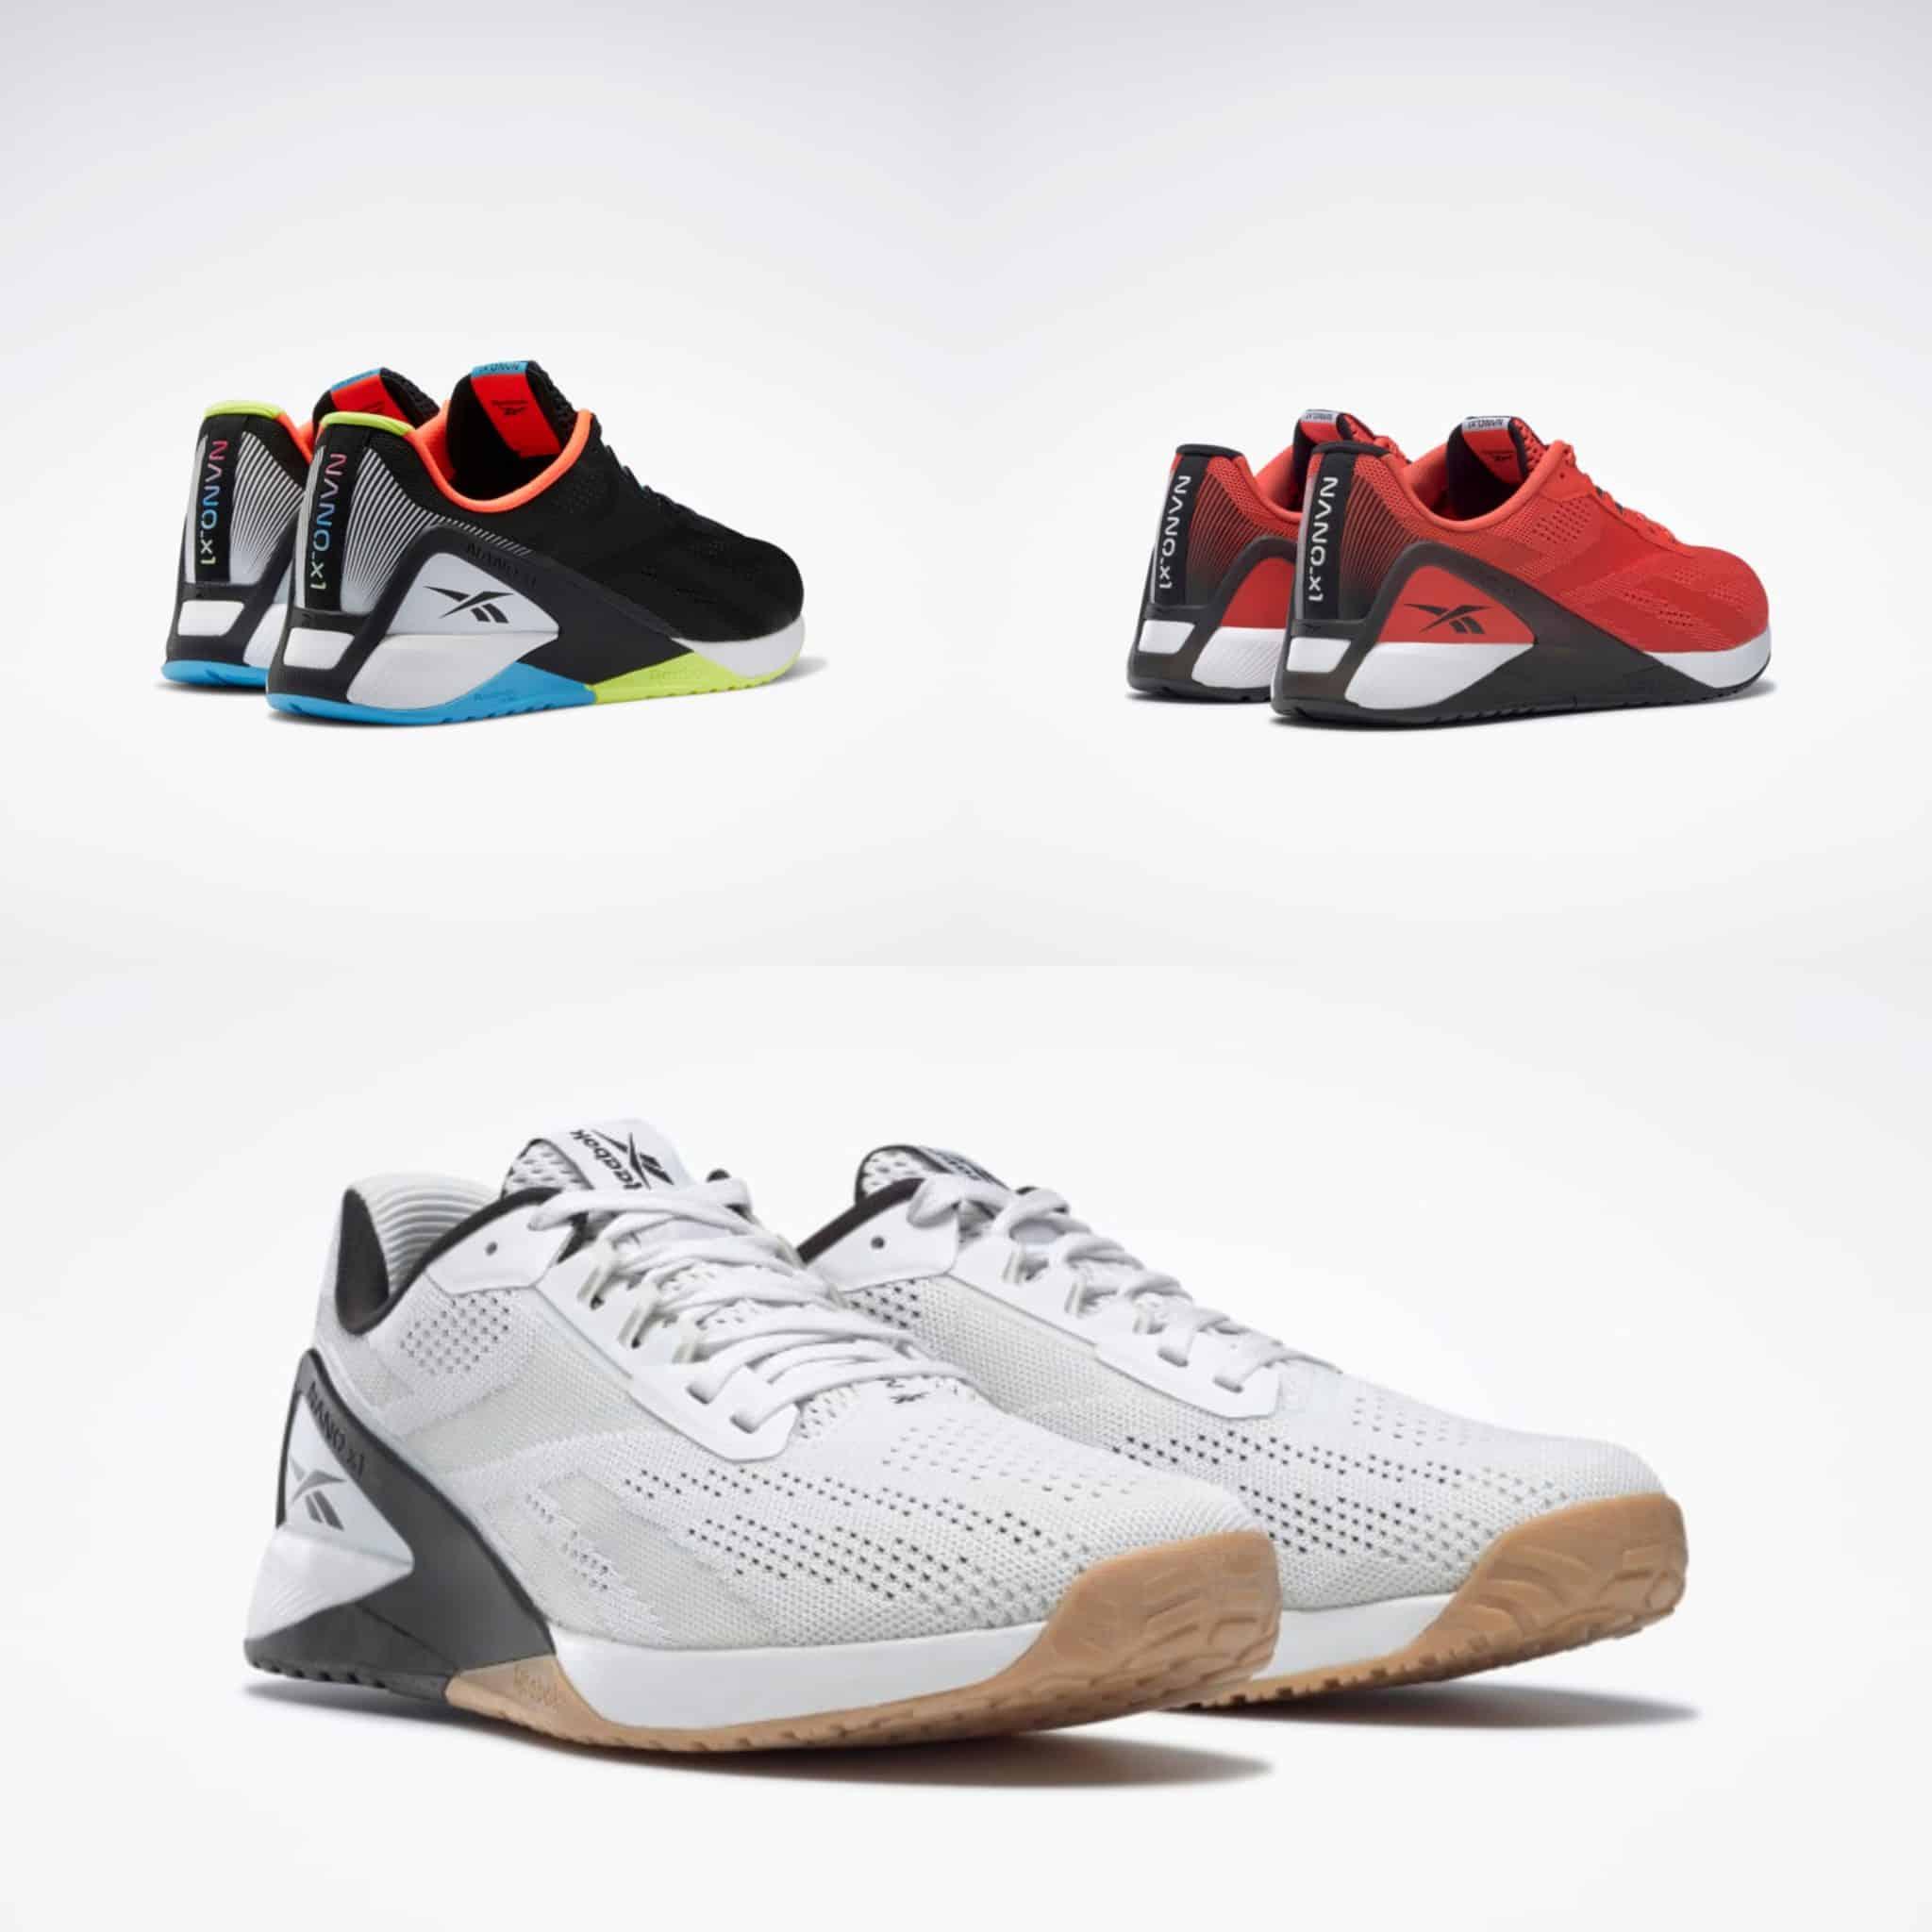 Adidas nano x1 collage